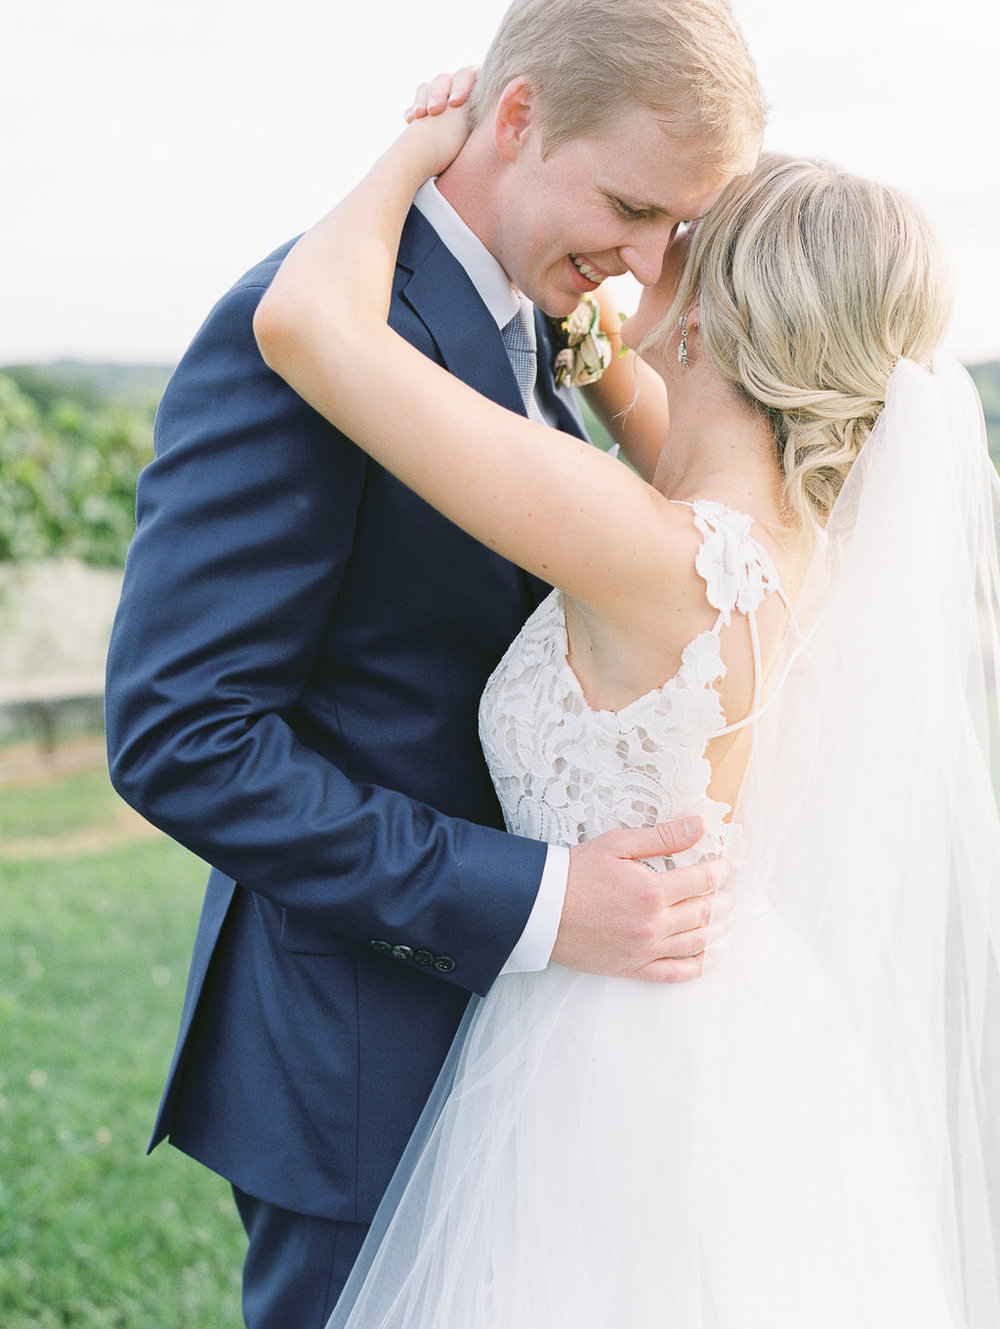 montaluce-winery-dahlonega-atlanta-wedding-photographer-fine-art-film-hannah-forsberg45.JPG